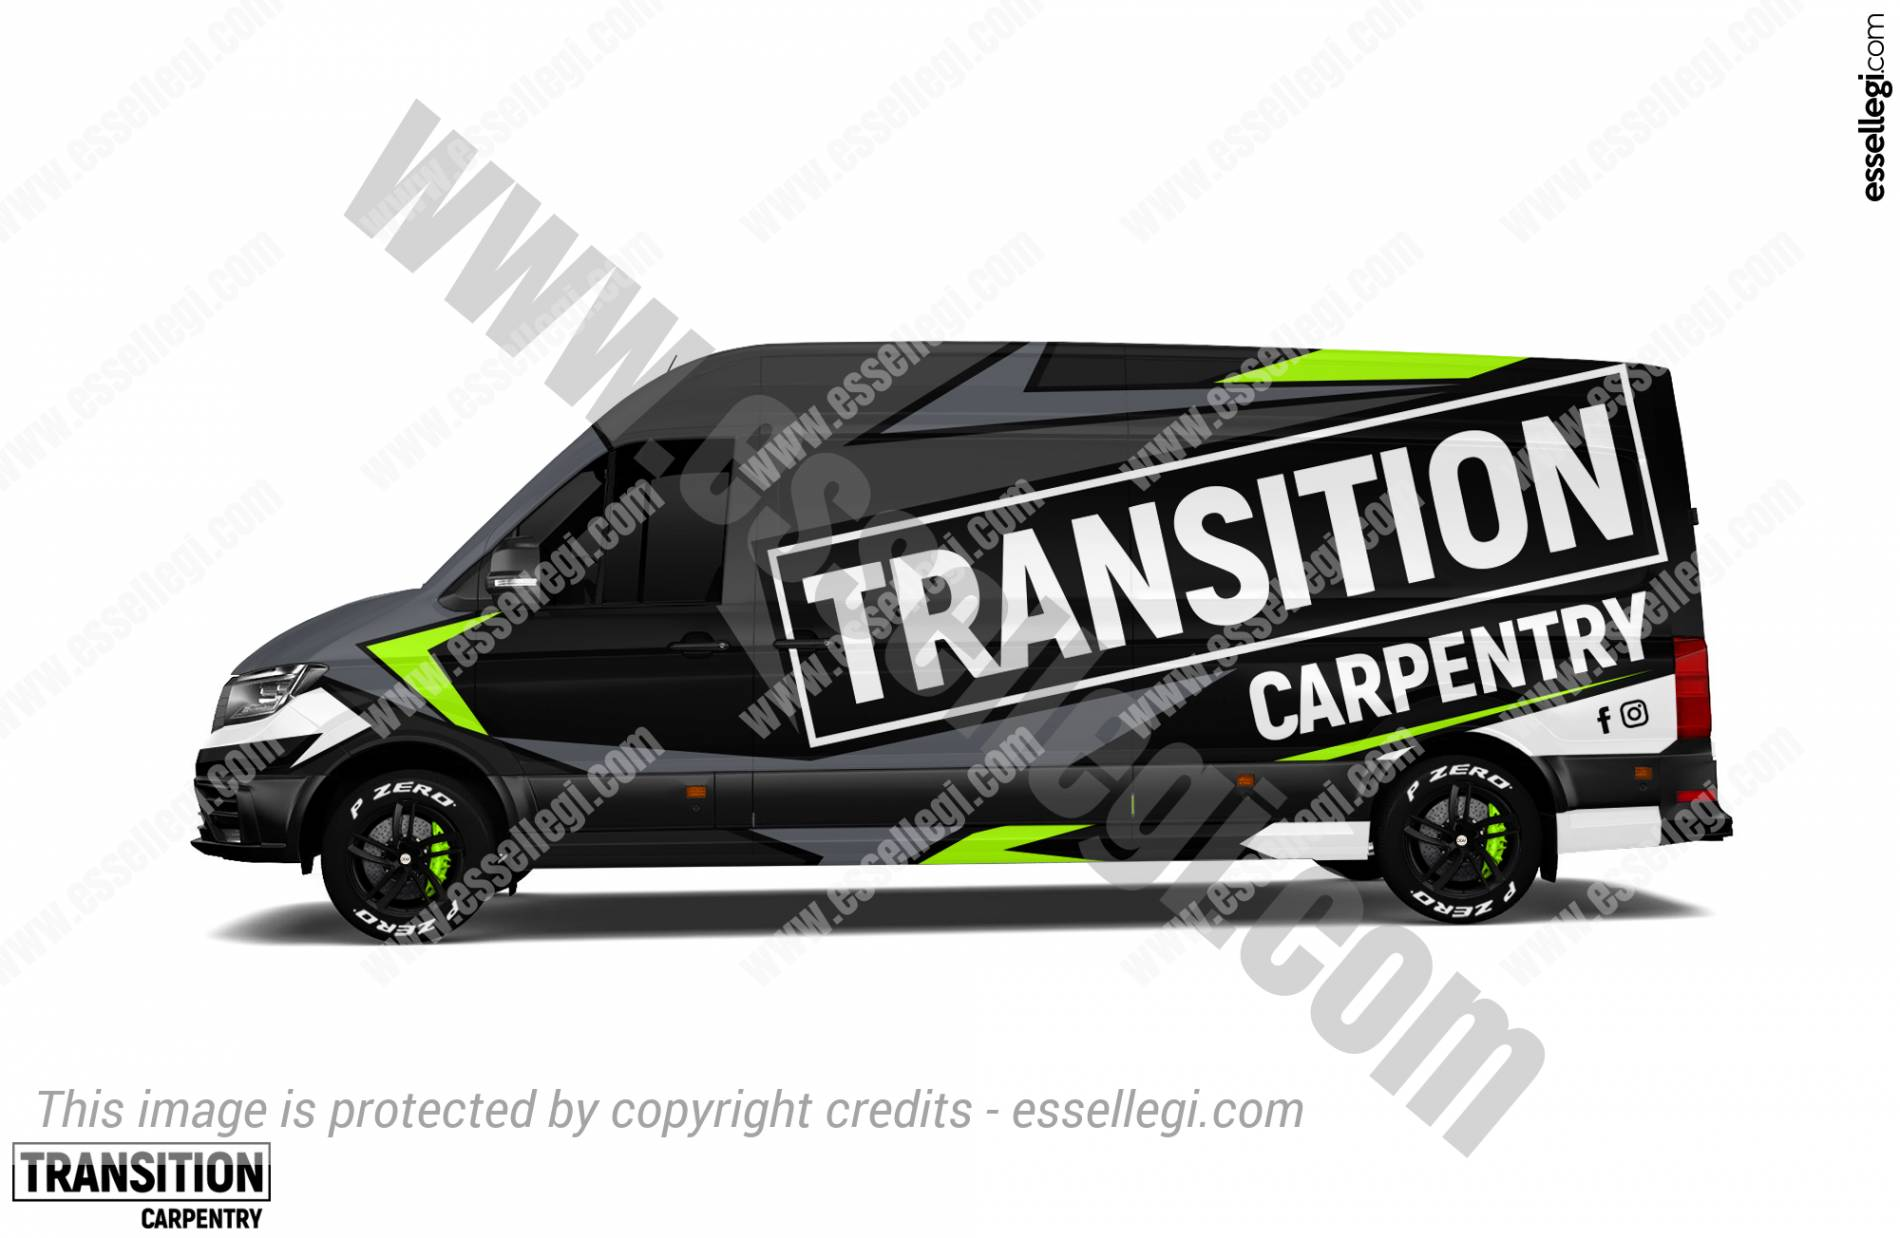 TRANSITION CARPENTRY | VAN WRAP DESIGN 🇦🇺